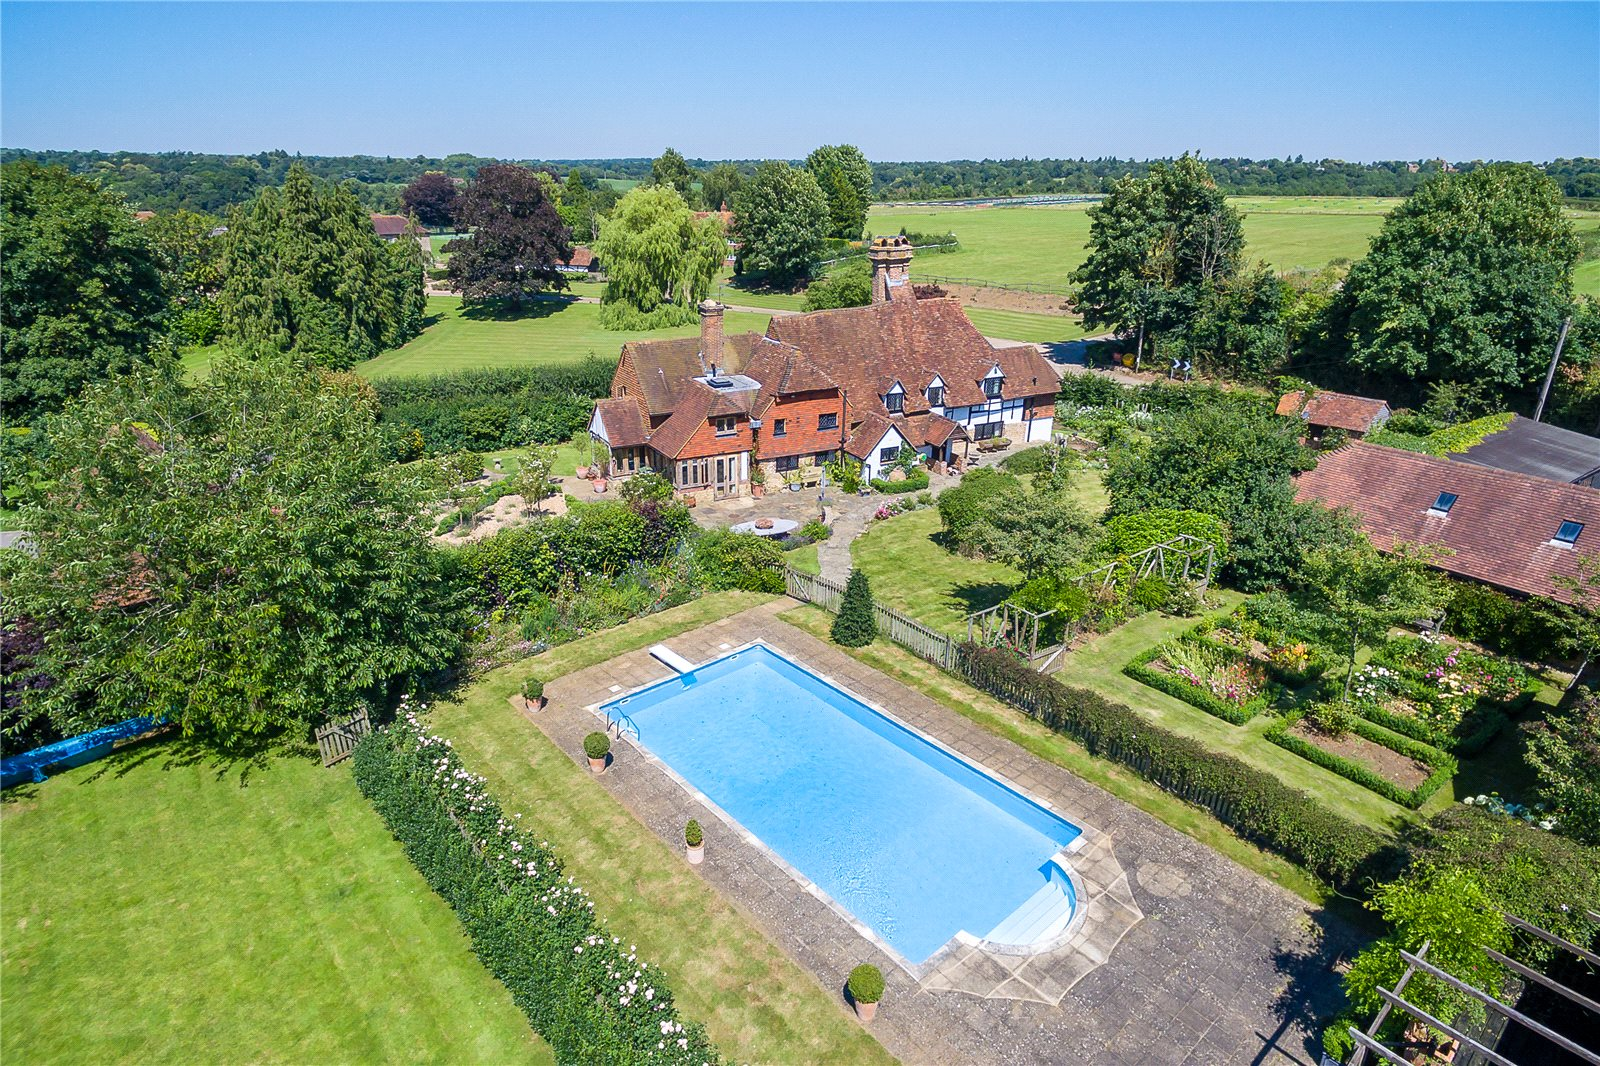 Villa per Vendita alle ore Eashing Lane, Godalming, Surrey, GU7 Godalming, Inghilterra